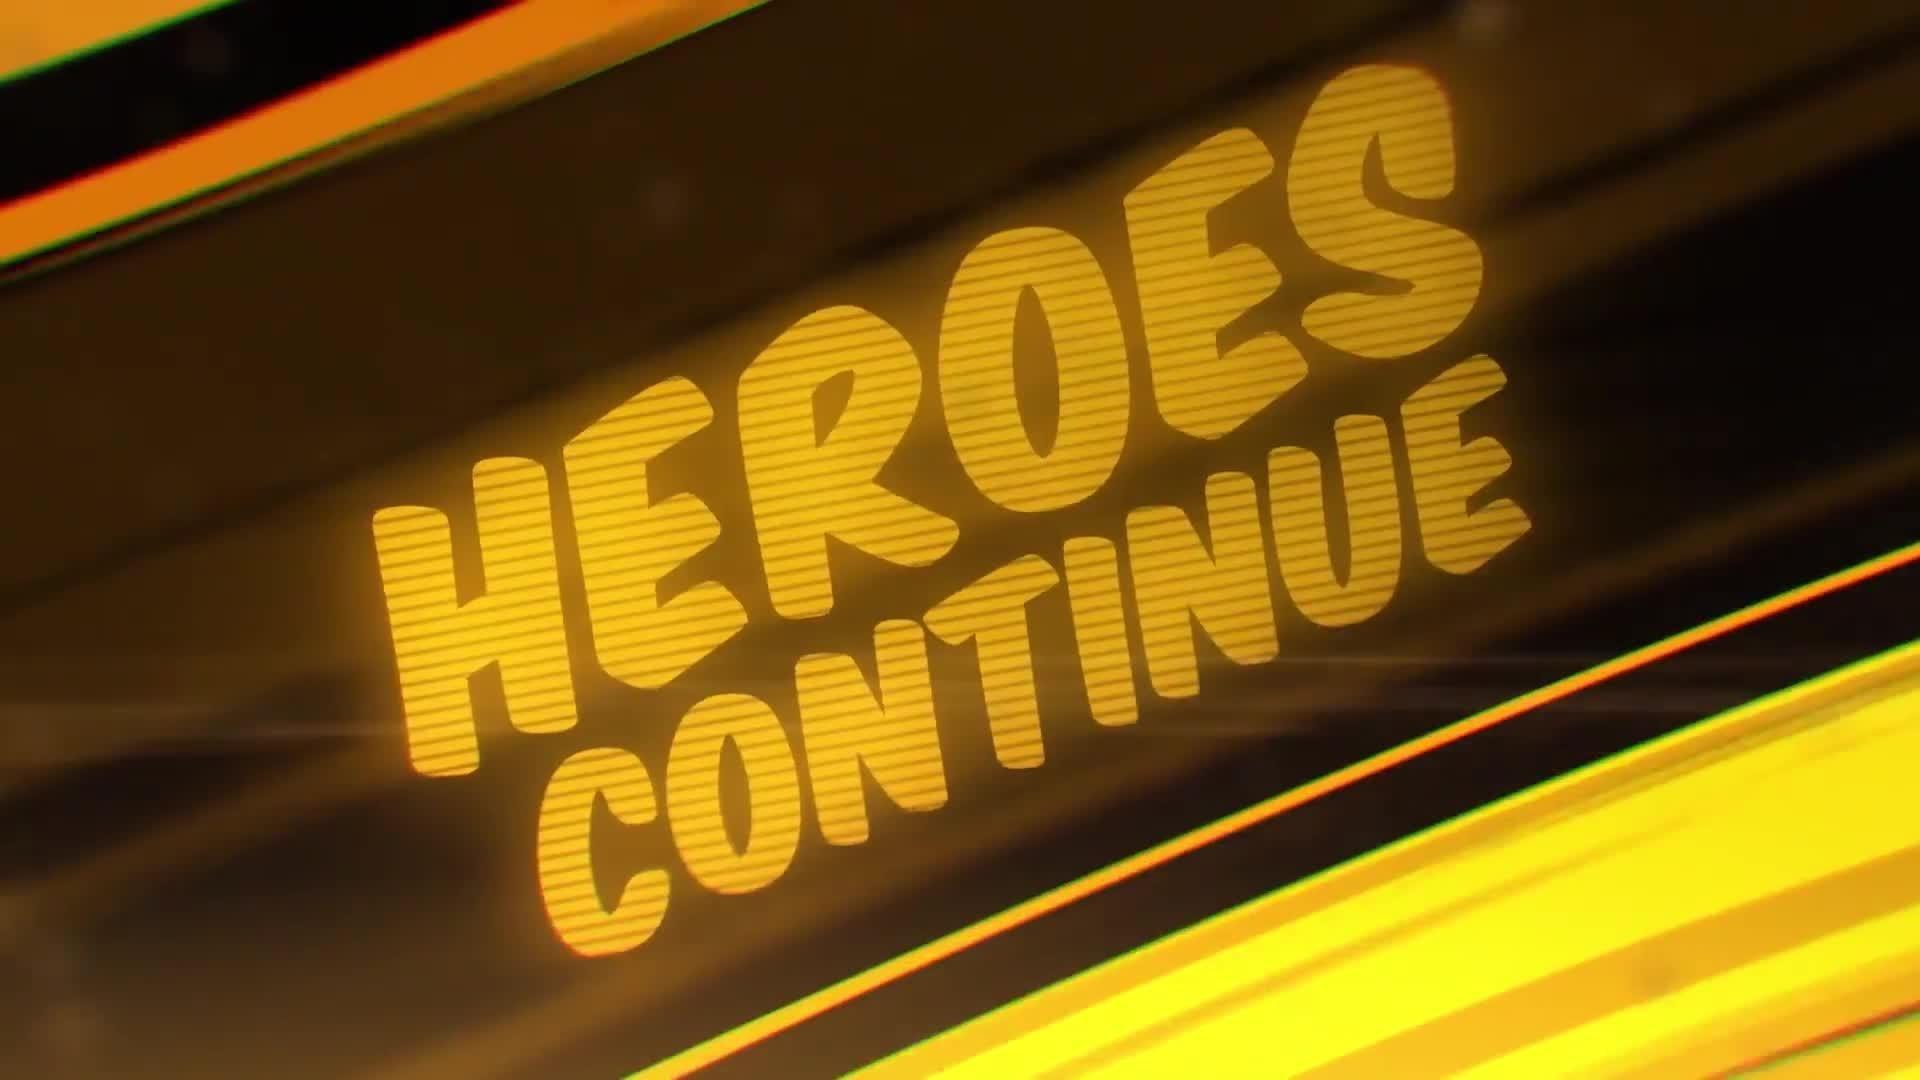 Next Up Hero Announcement Trailer screen capture